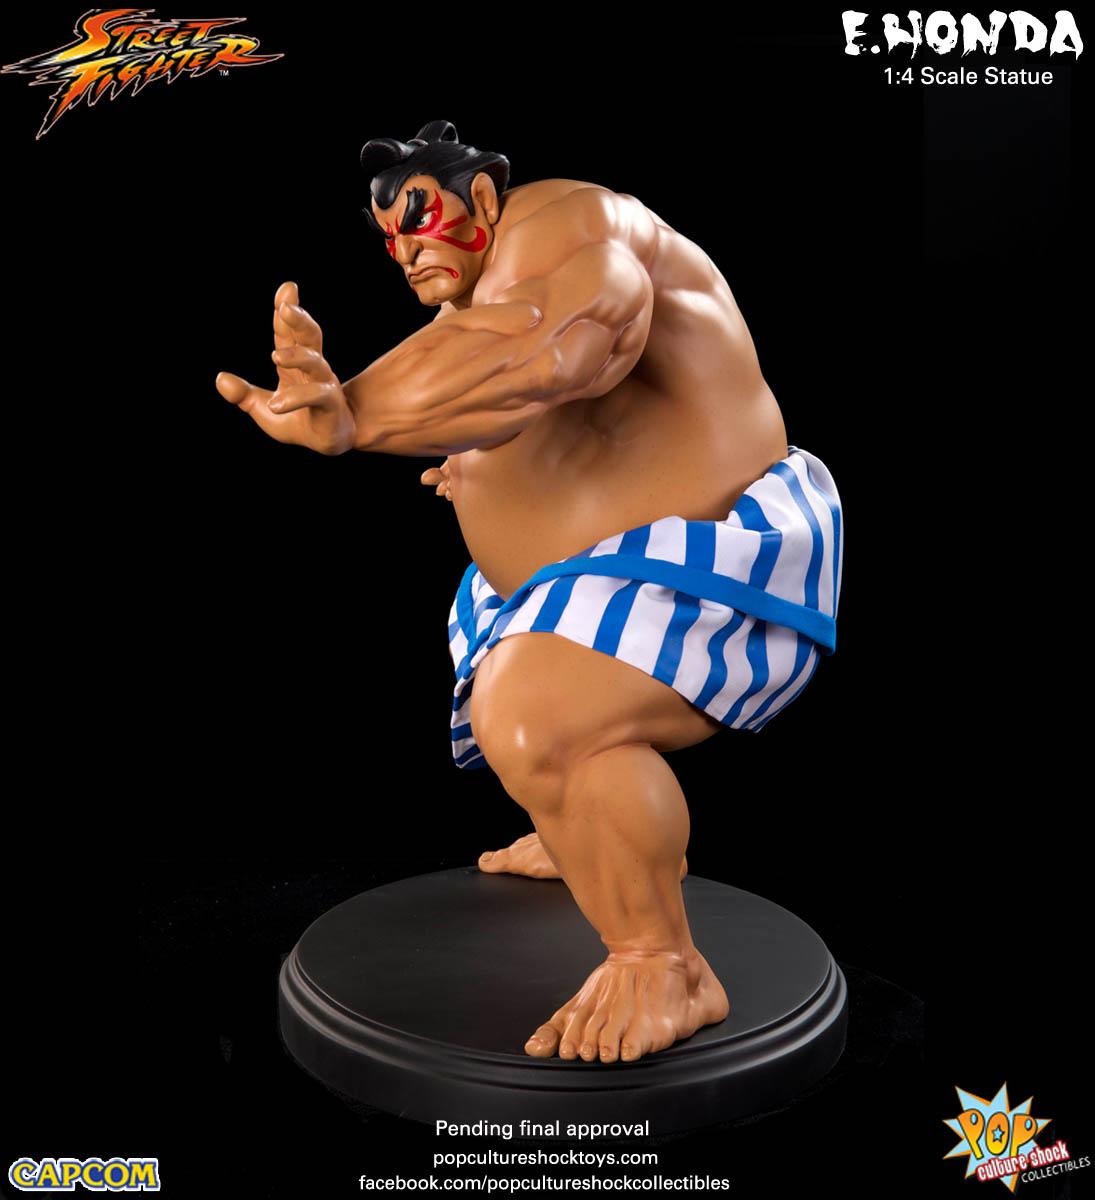 [Pop Culture Shock] Street Fighter: E. Honda 1/4 Statue - Página 3 Street-Fighter-E.-Honda-Regular-Statue-011